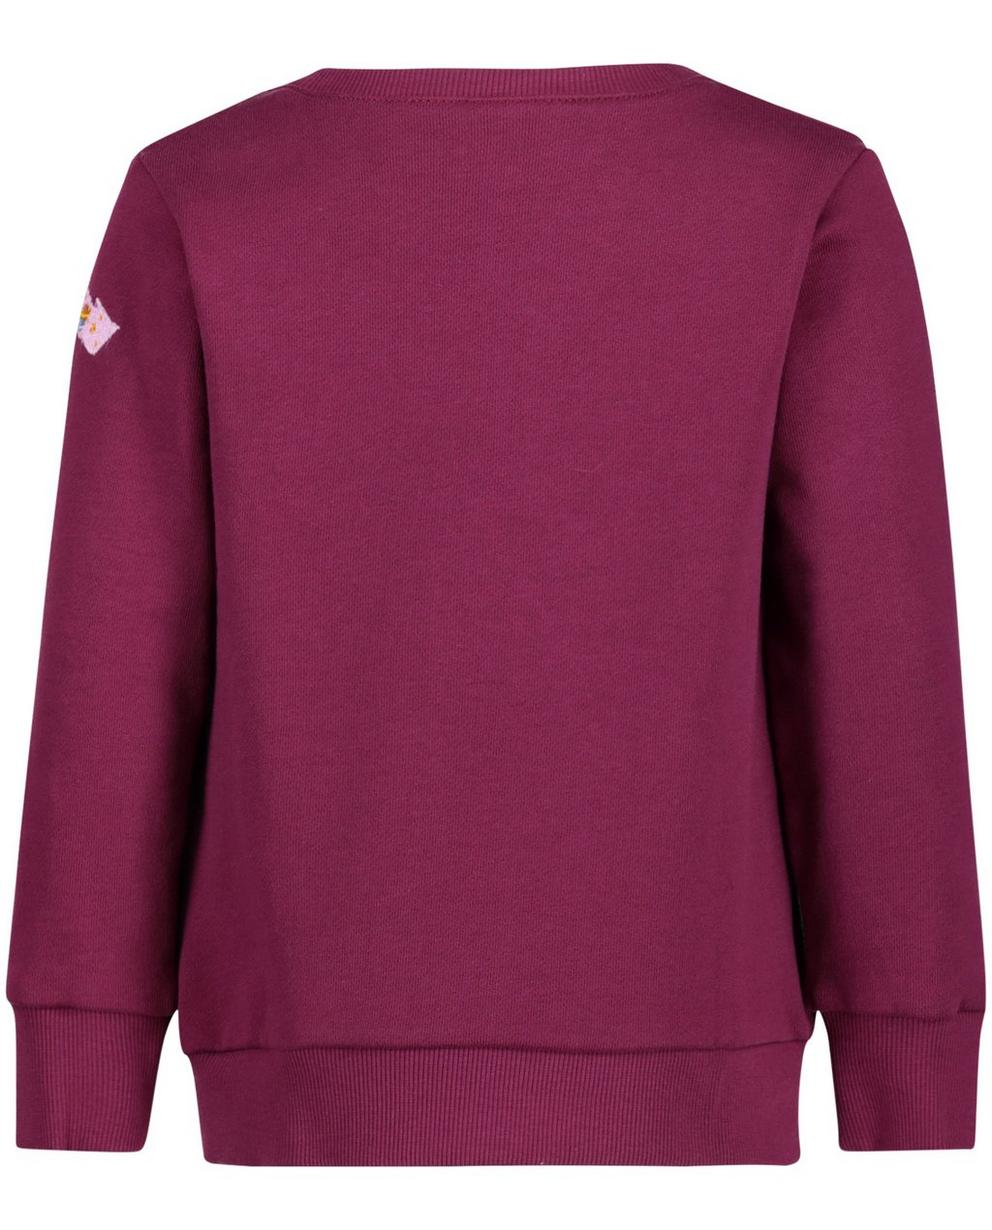 Sweaters - RDM - Purperen sweater